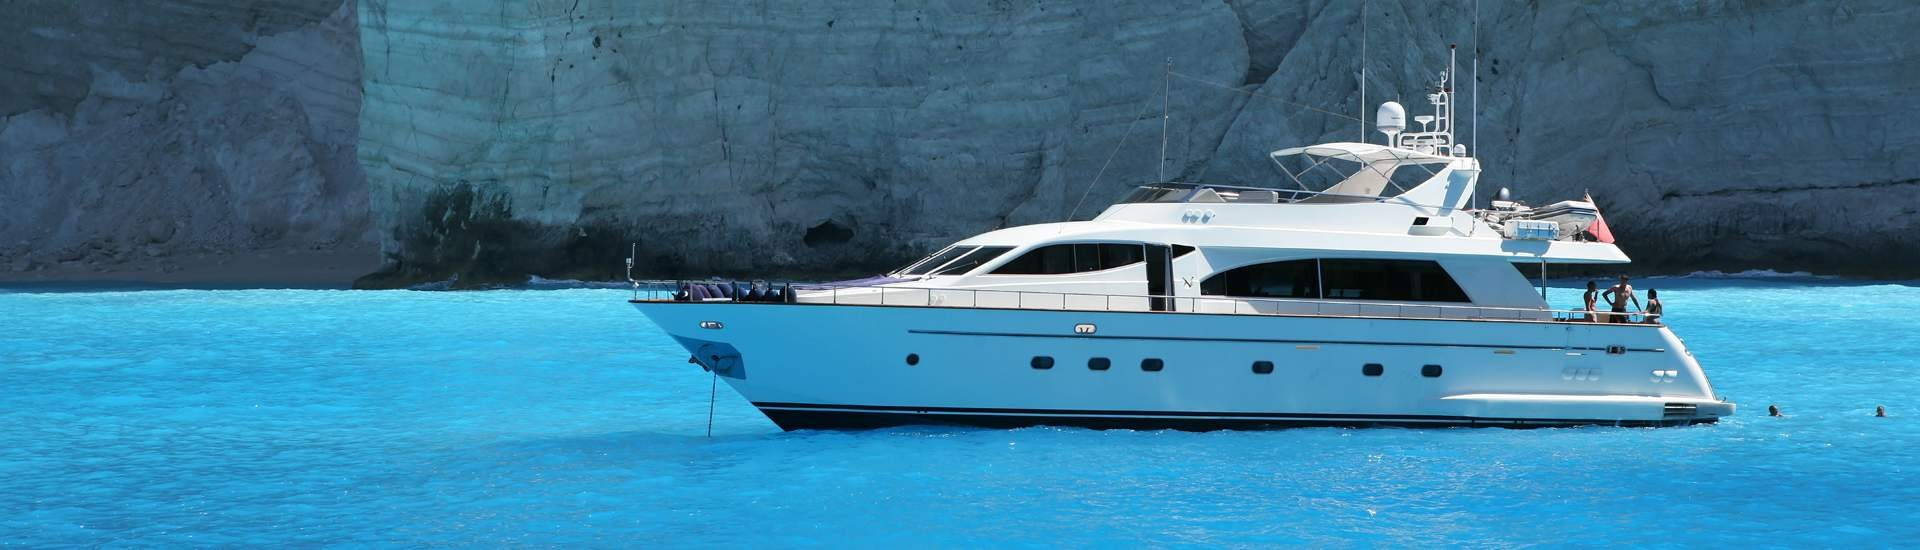 Greece Motor Yacht charter